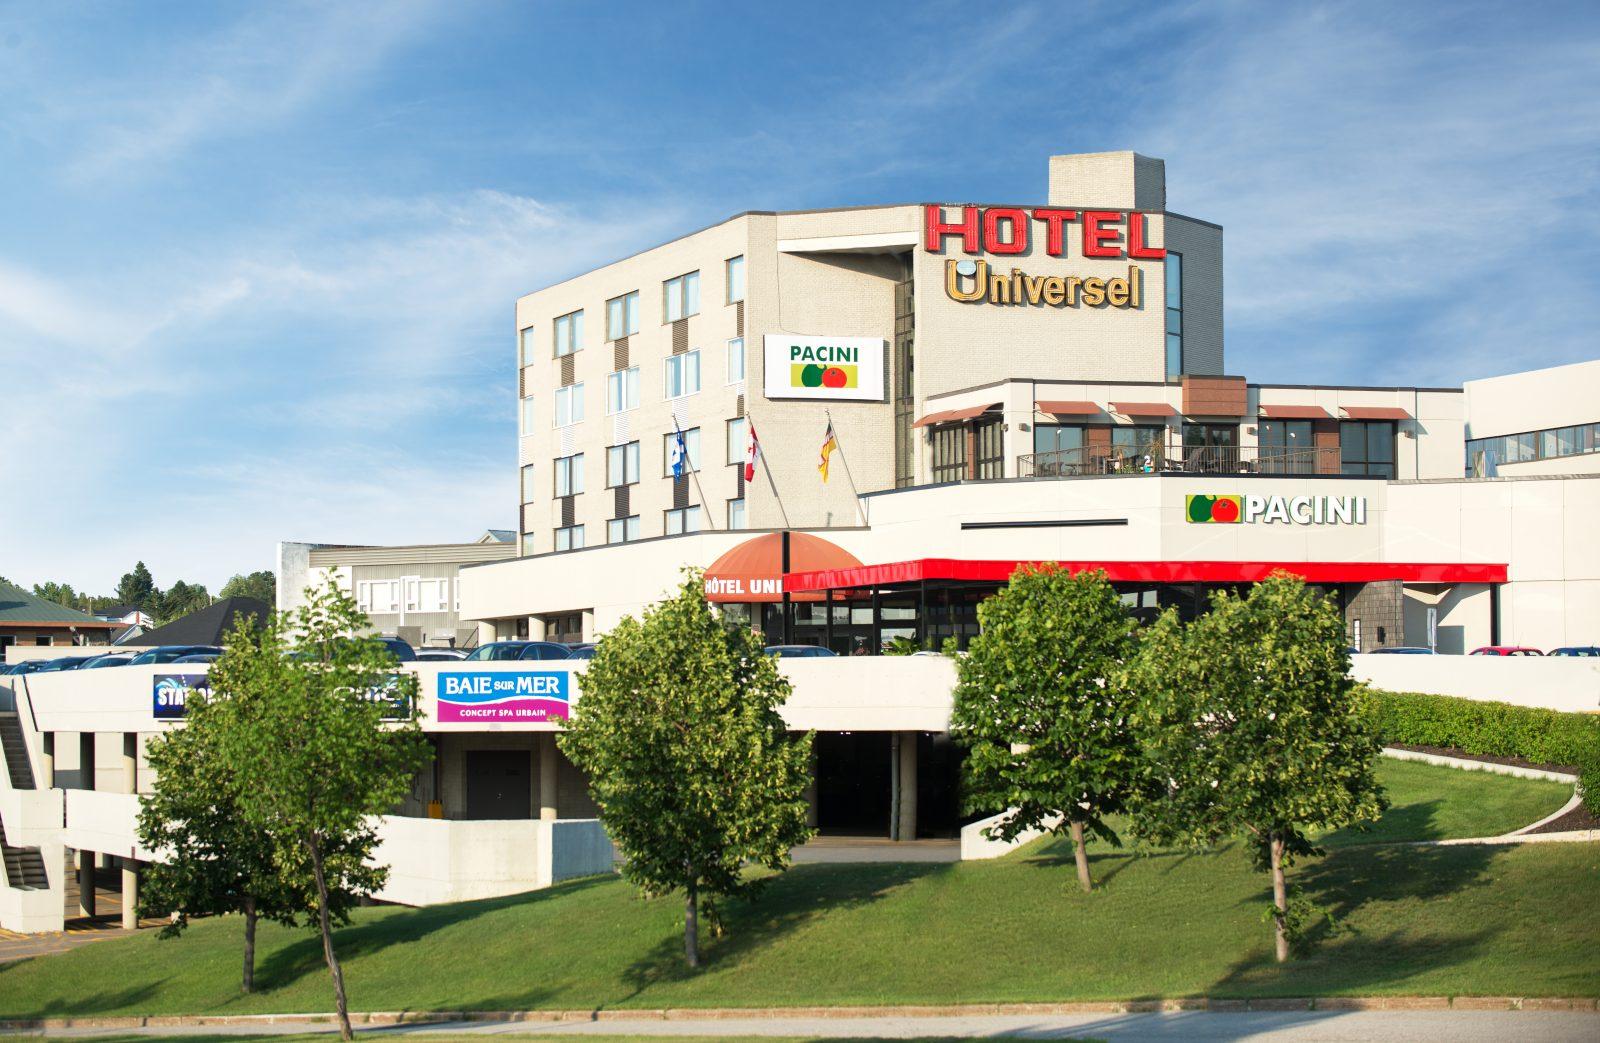 https://www.hoteluniversel.com/wp-content/uploads/2018/09/HOTEL-UNIVERSELHR-1-1600x1043.jpg